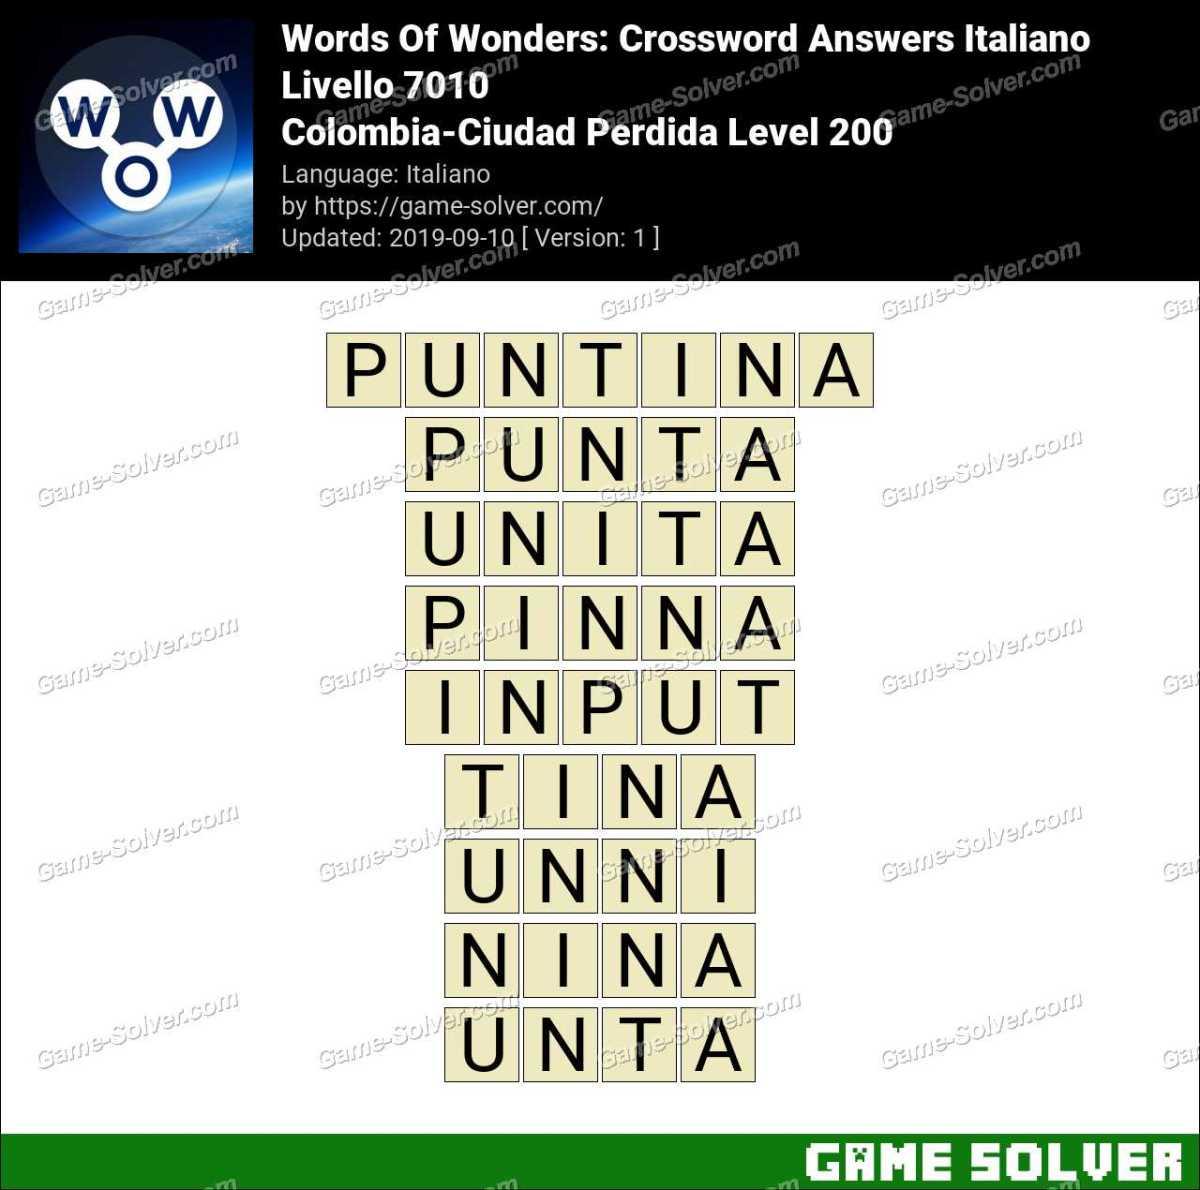 Words Of Wonders Colombia-Ciudad Perdida Level 200 Answers